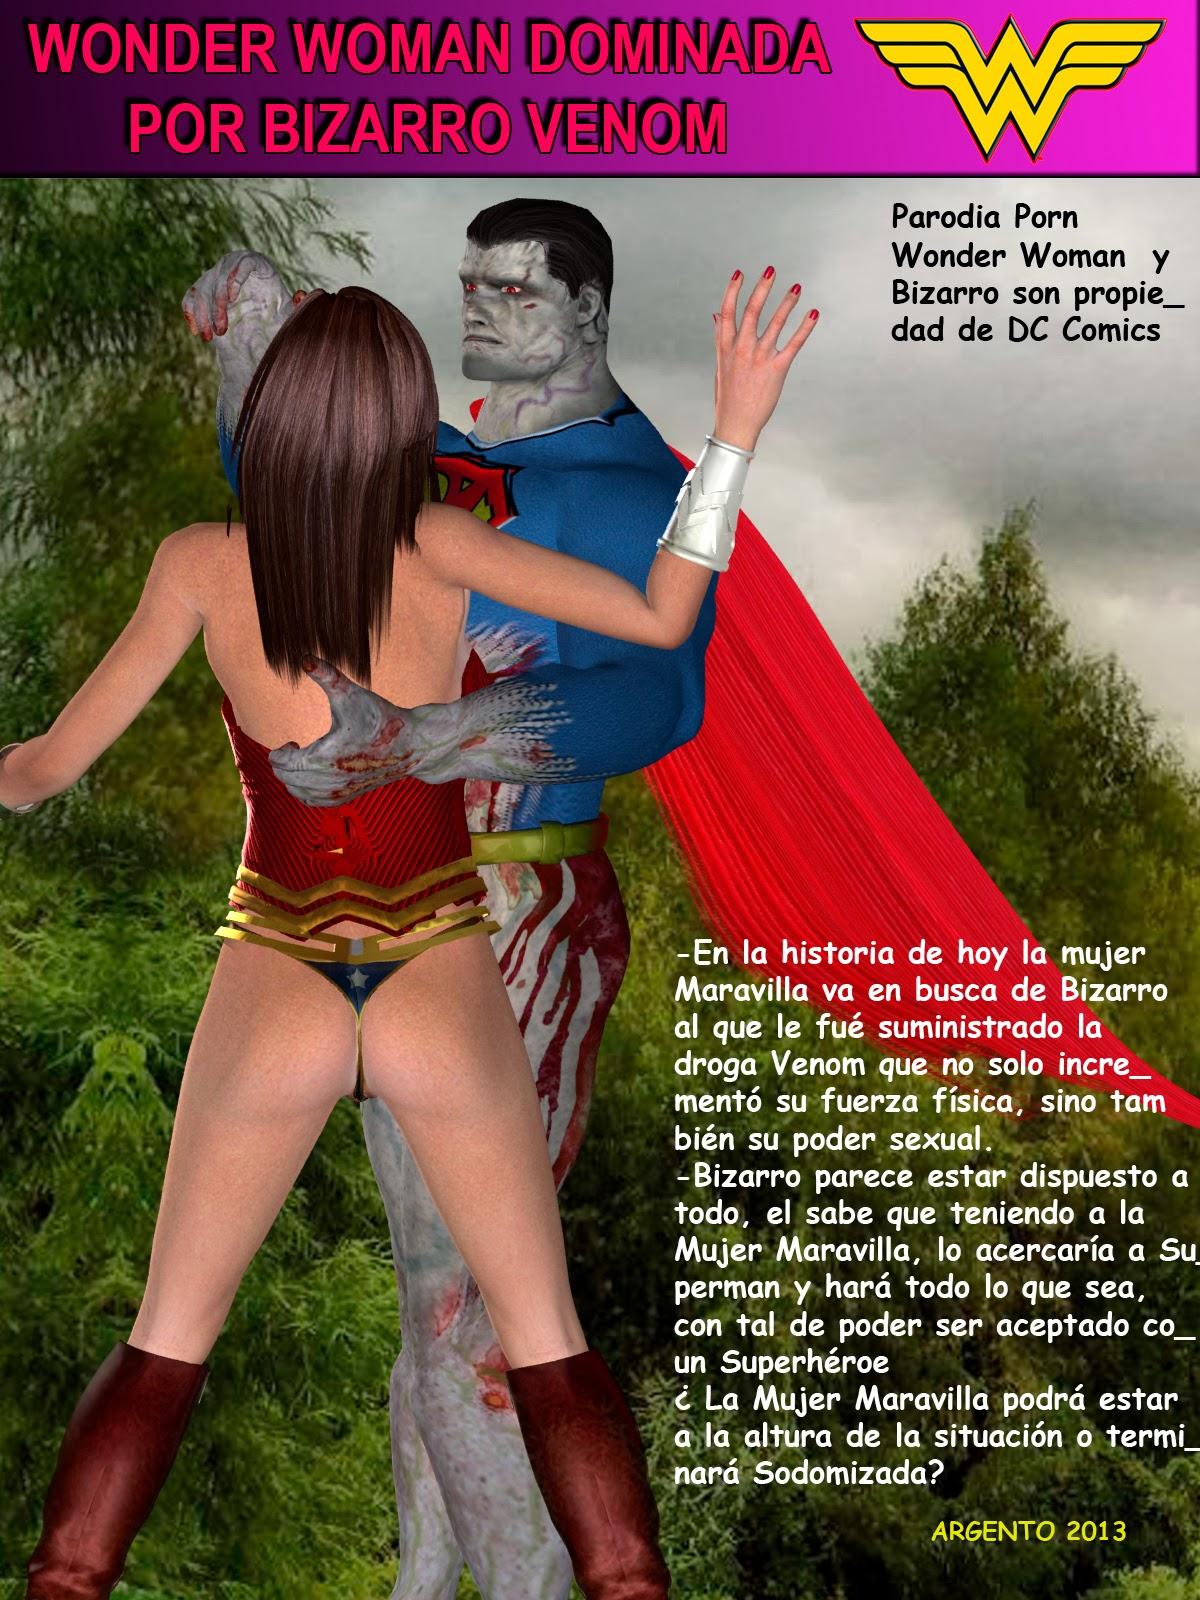 La Mujer Maravilla dominada por Bizarro